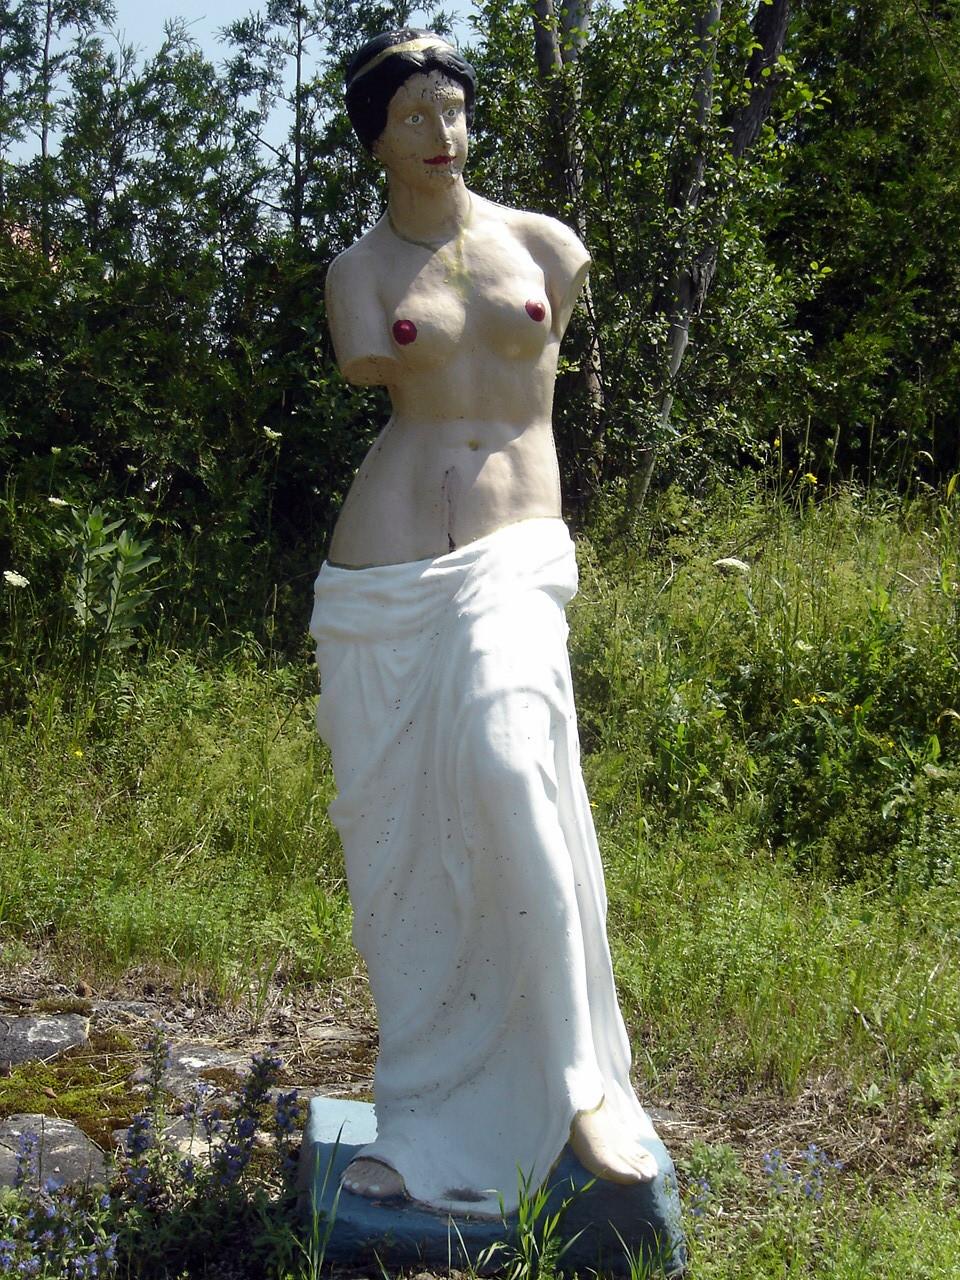 Are not Naked women garden statues amusing information